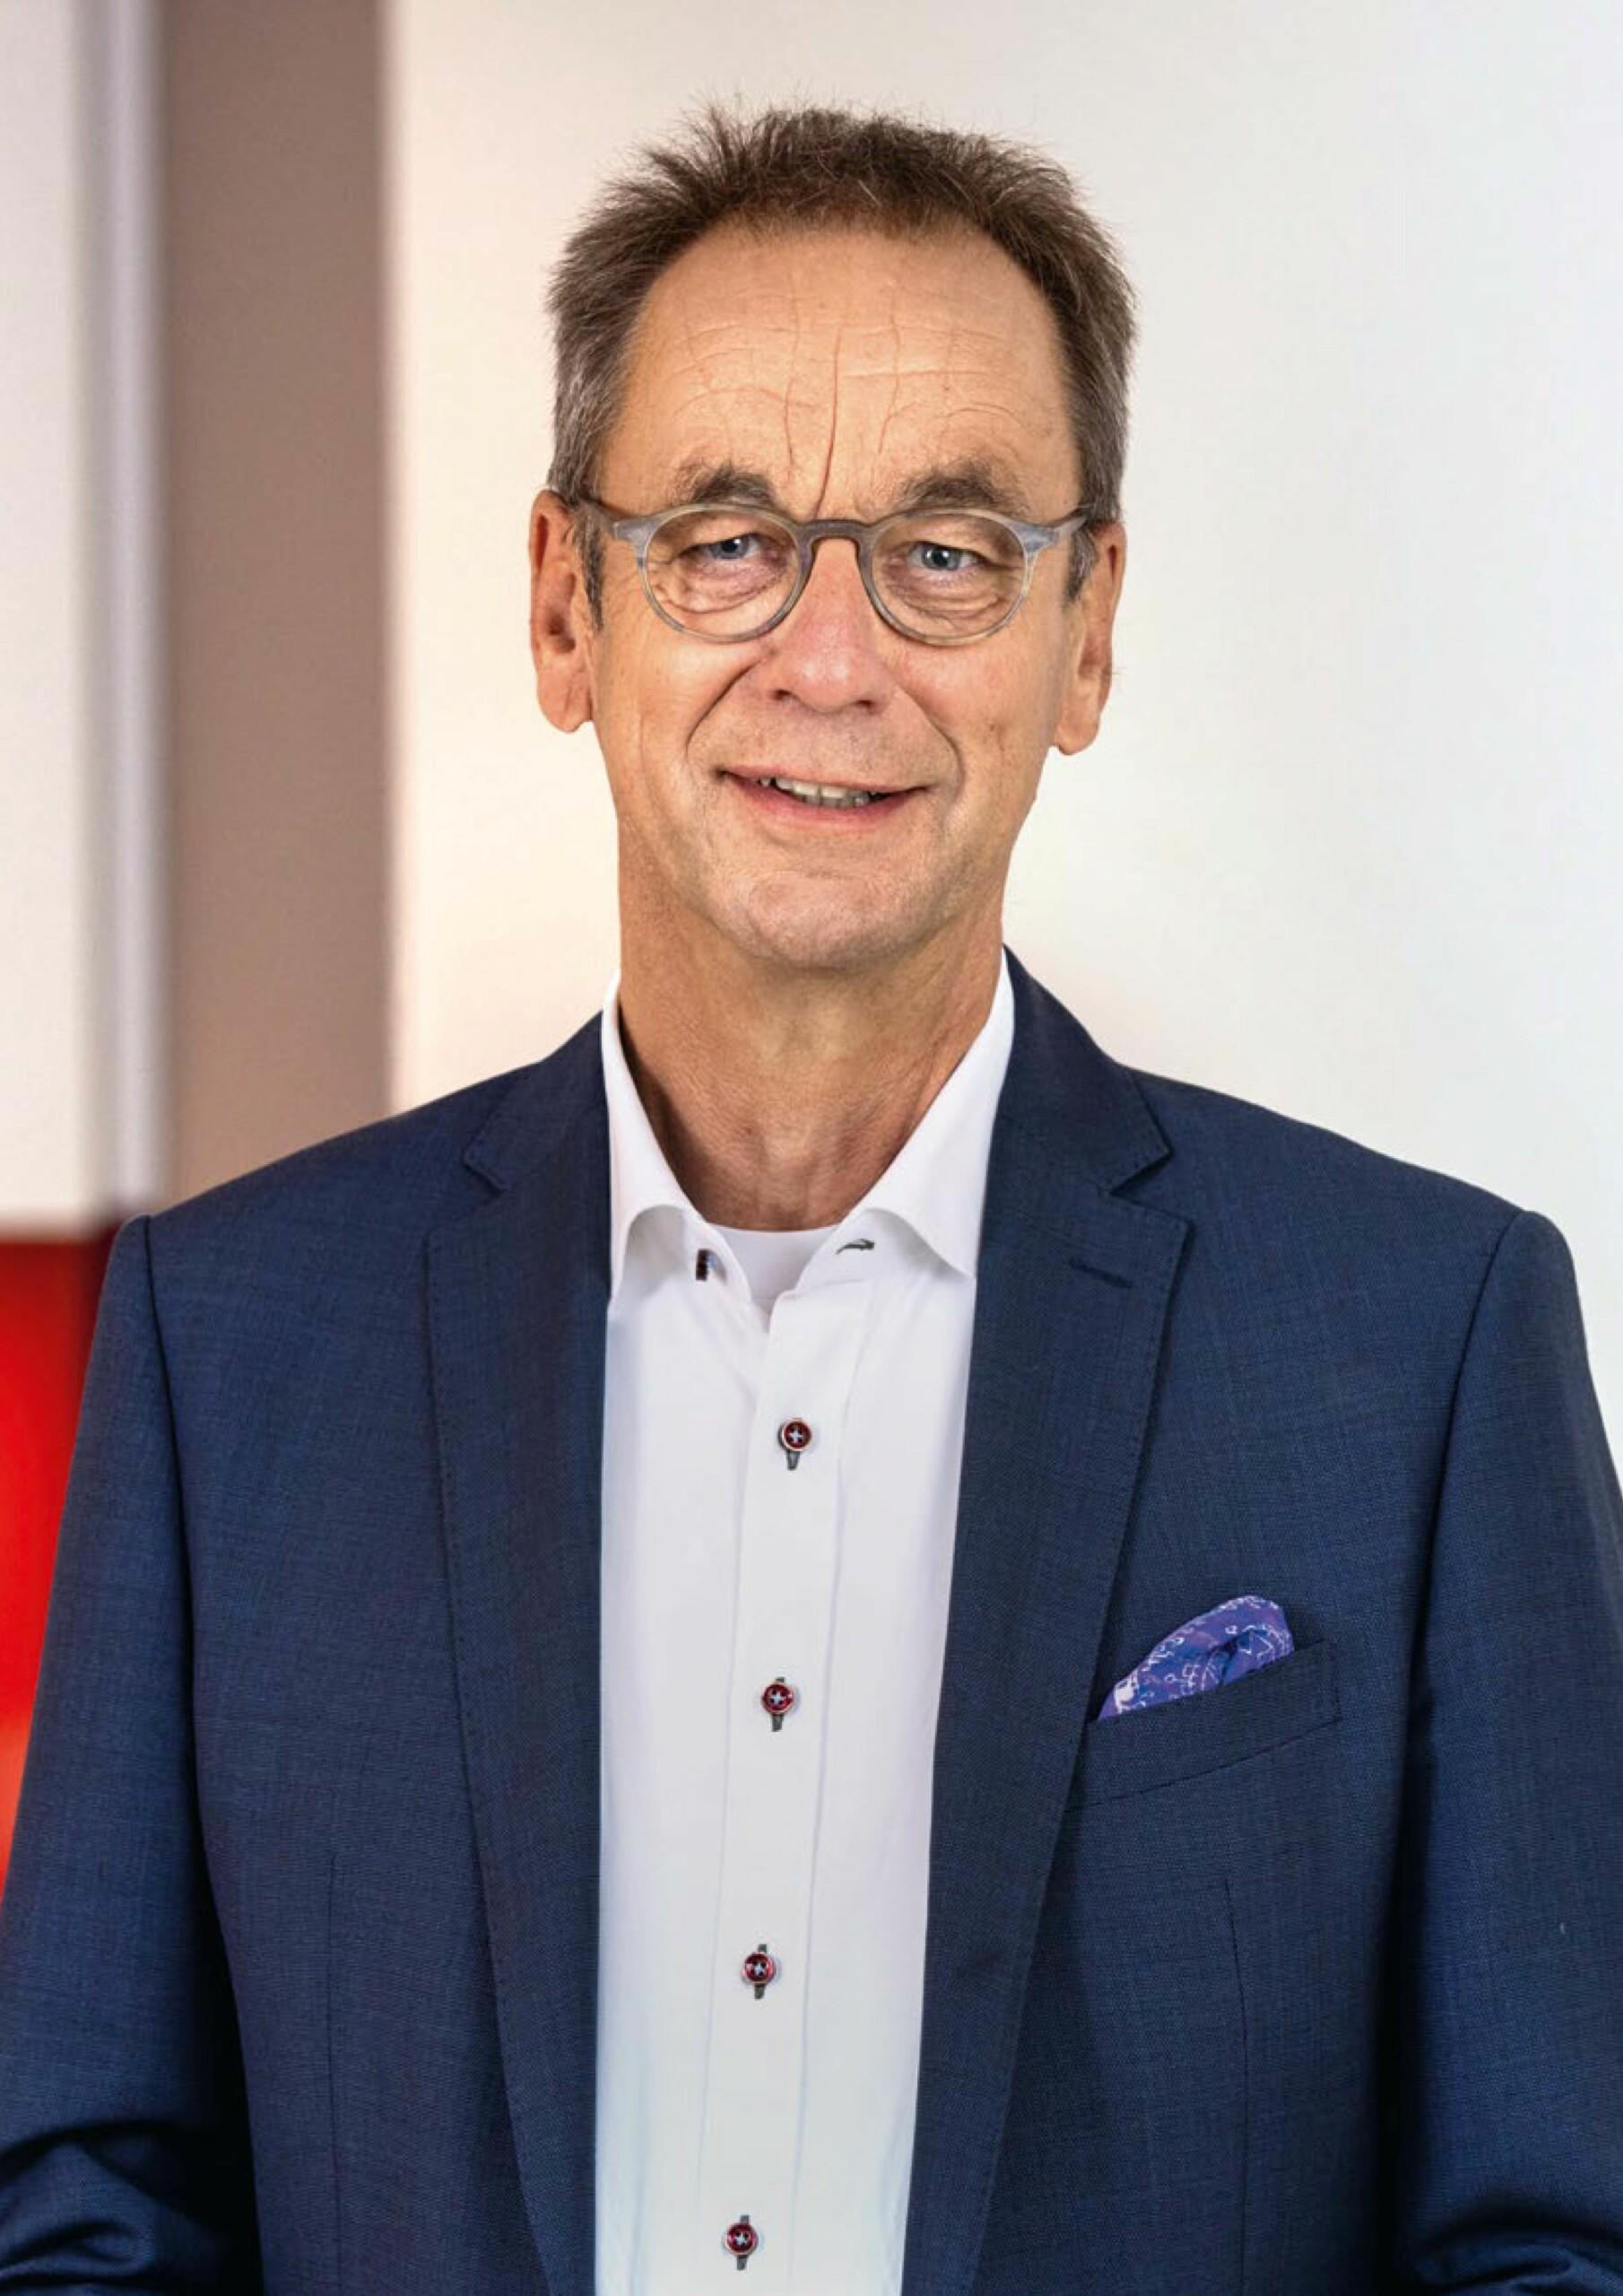 Foto © Mediengruppe Deutscher Apotheker Verlag